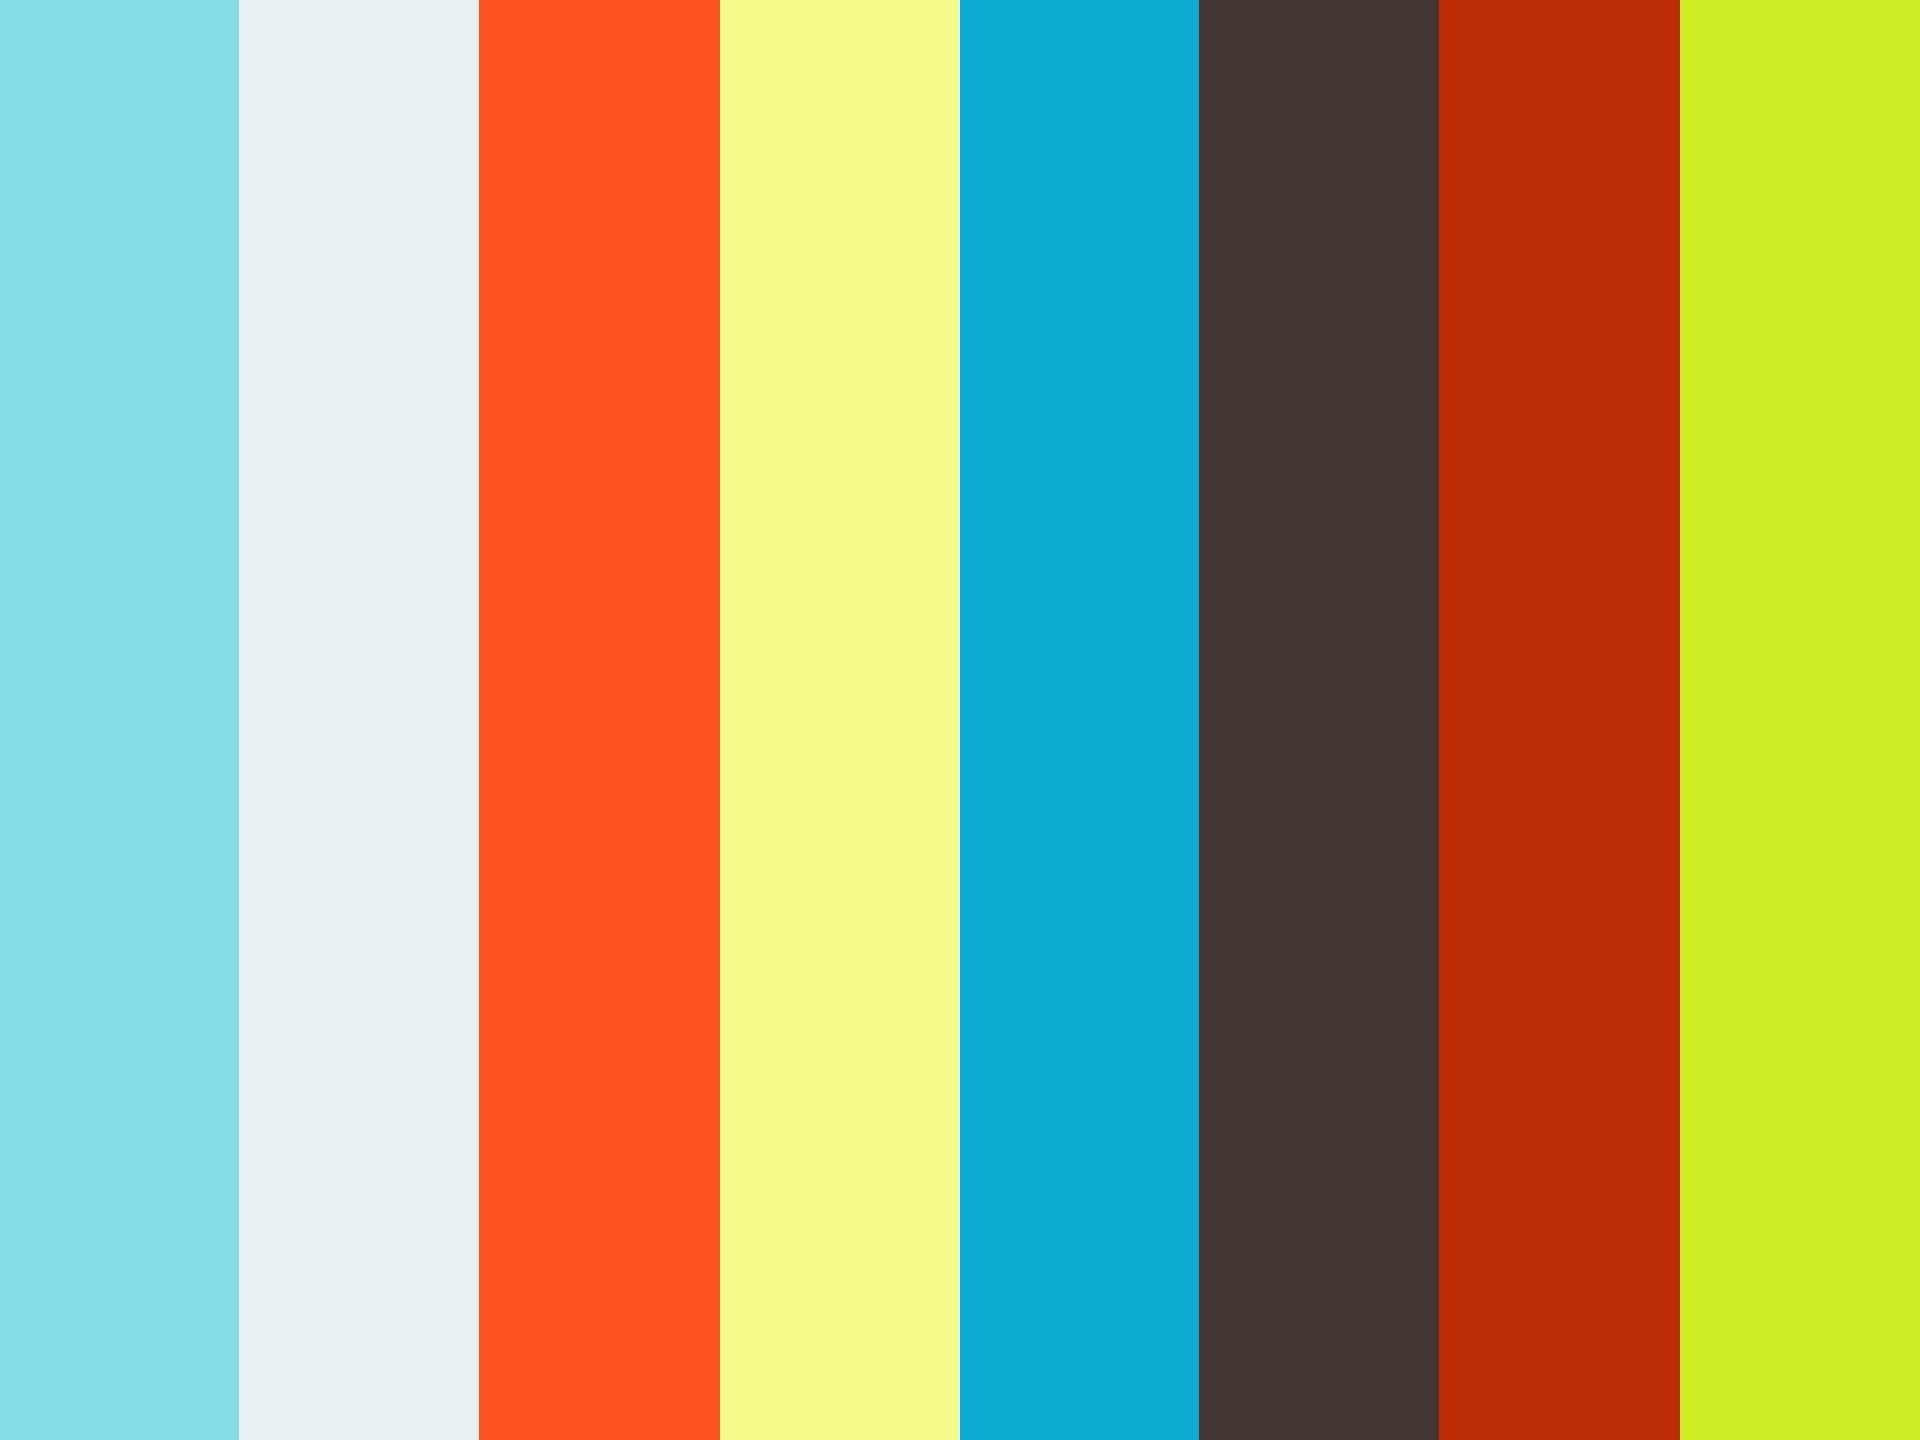 & Happyish Gecko - Lighting TD on Vimeo